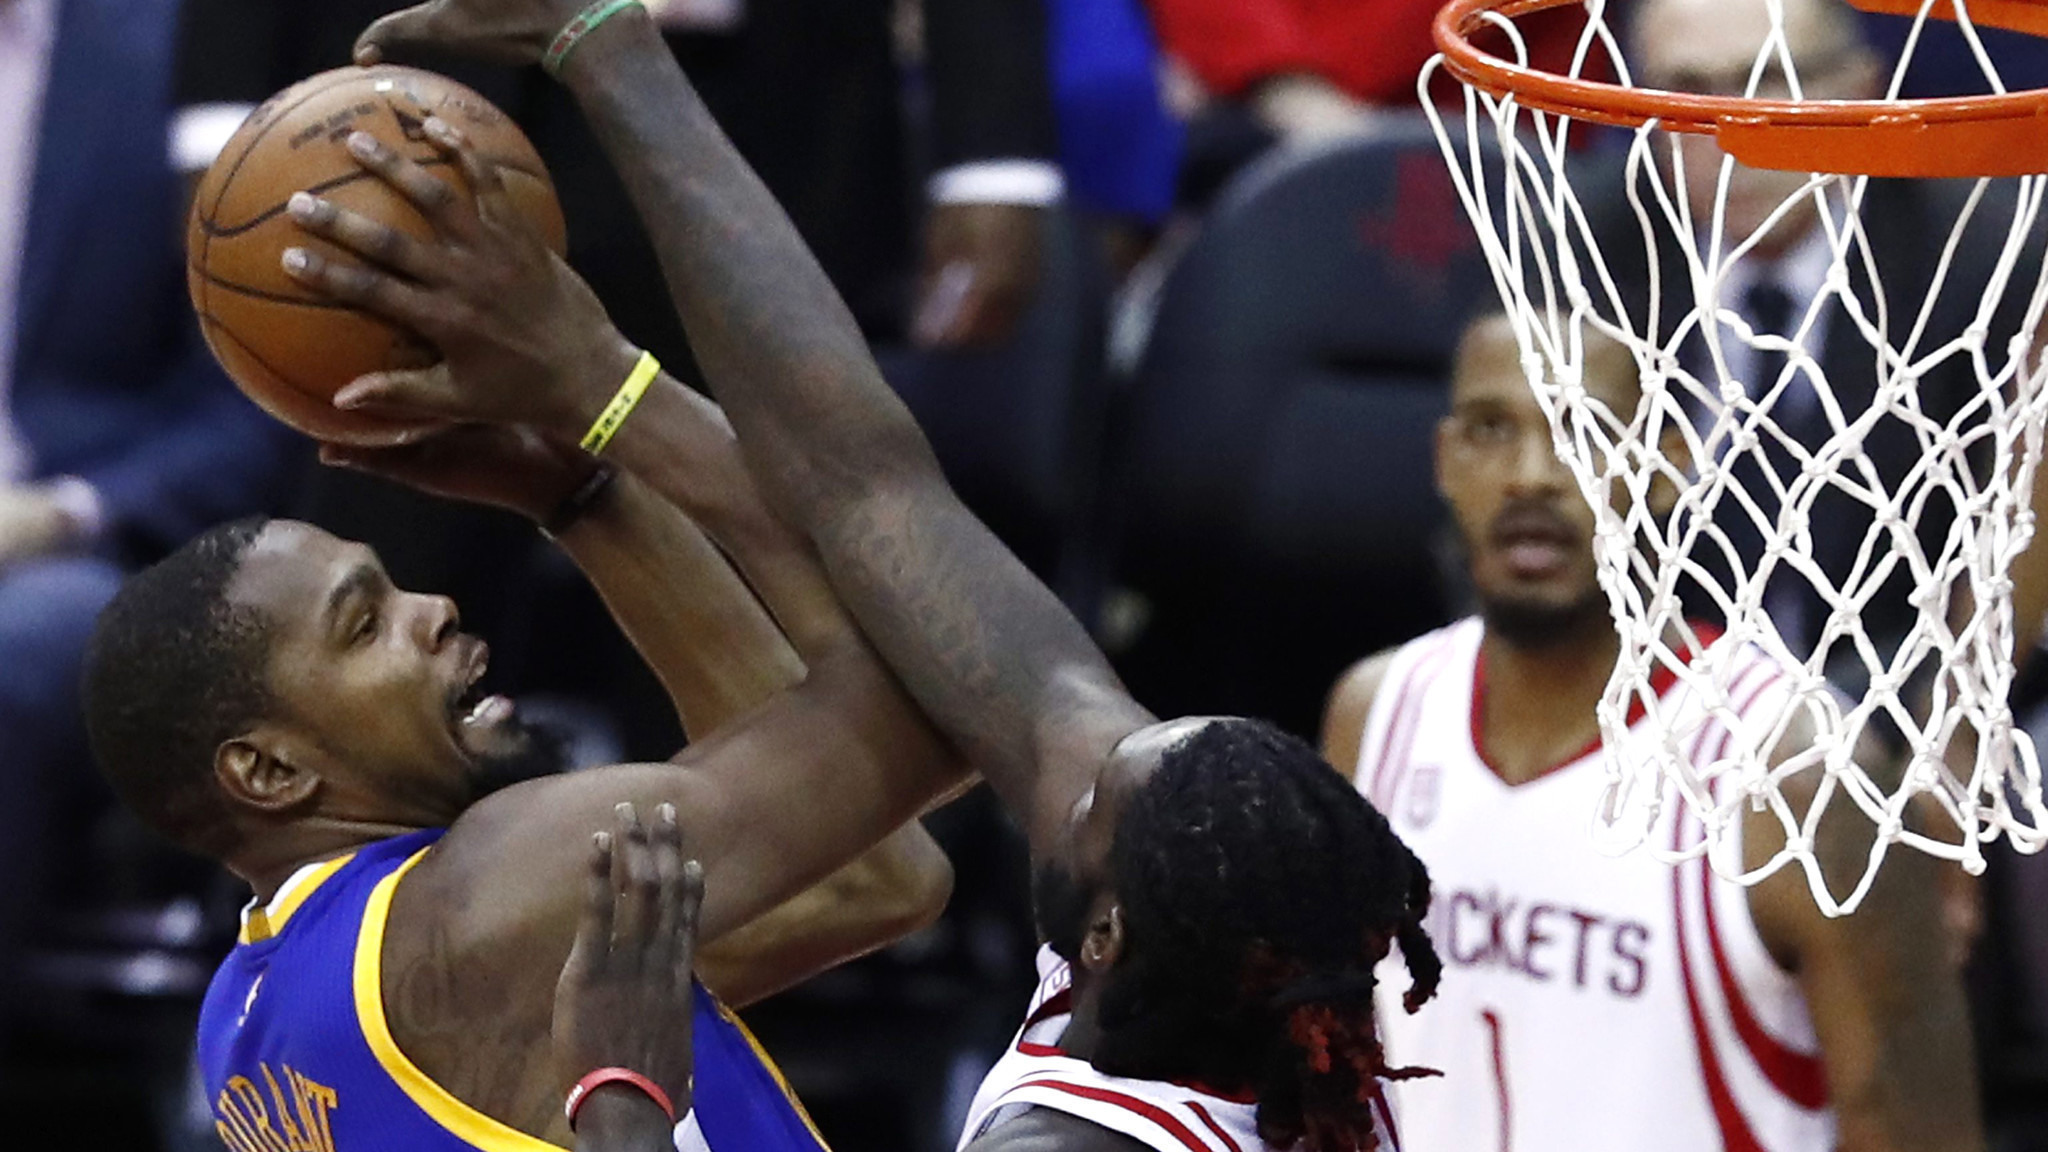 NBA roundup: Warriors win sixth in a row when Rockets fall short